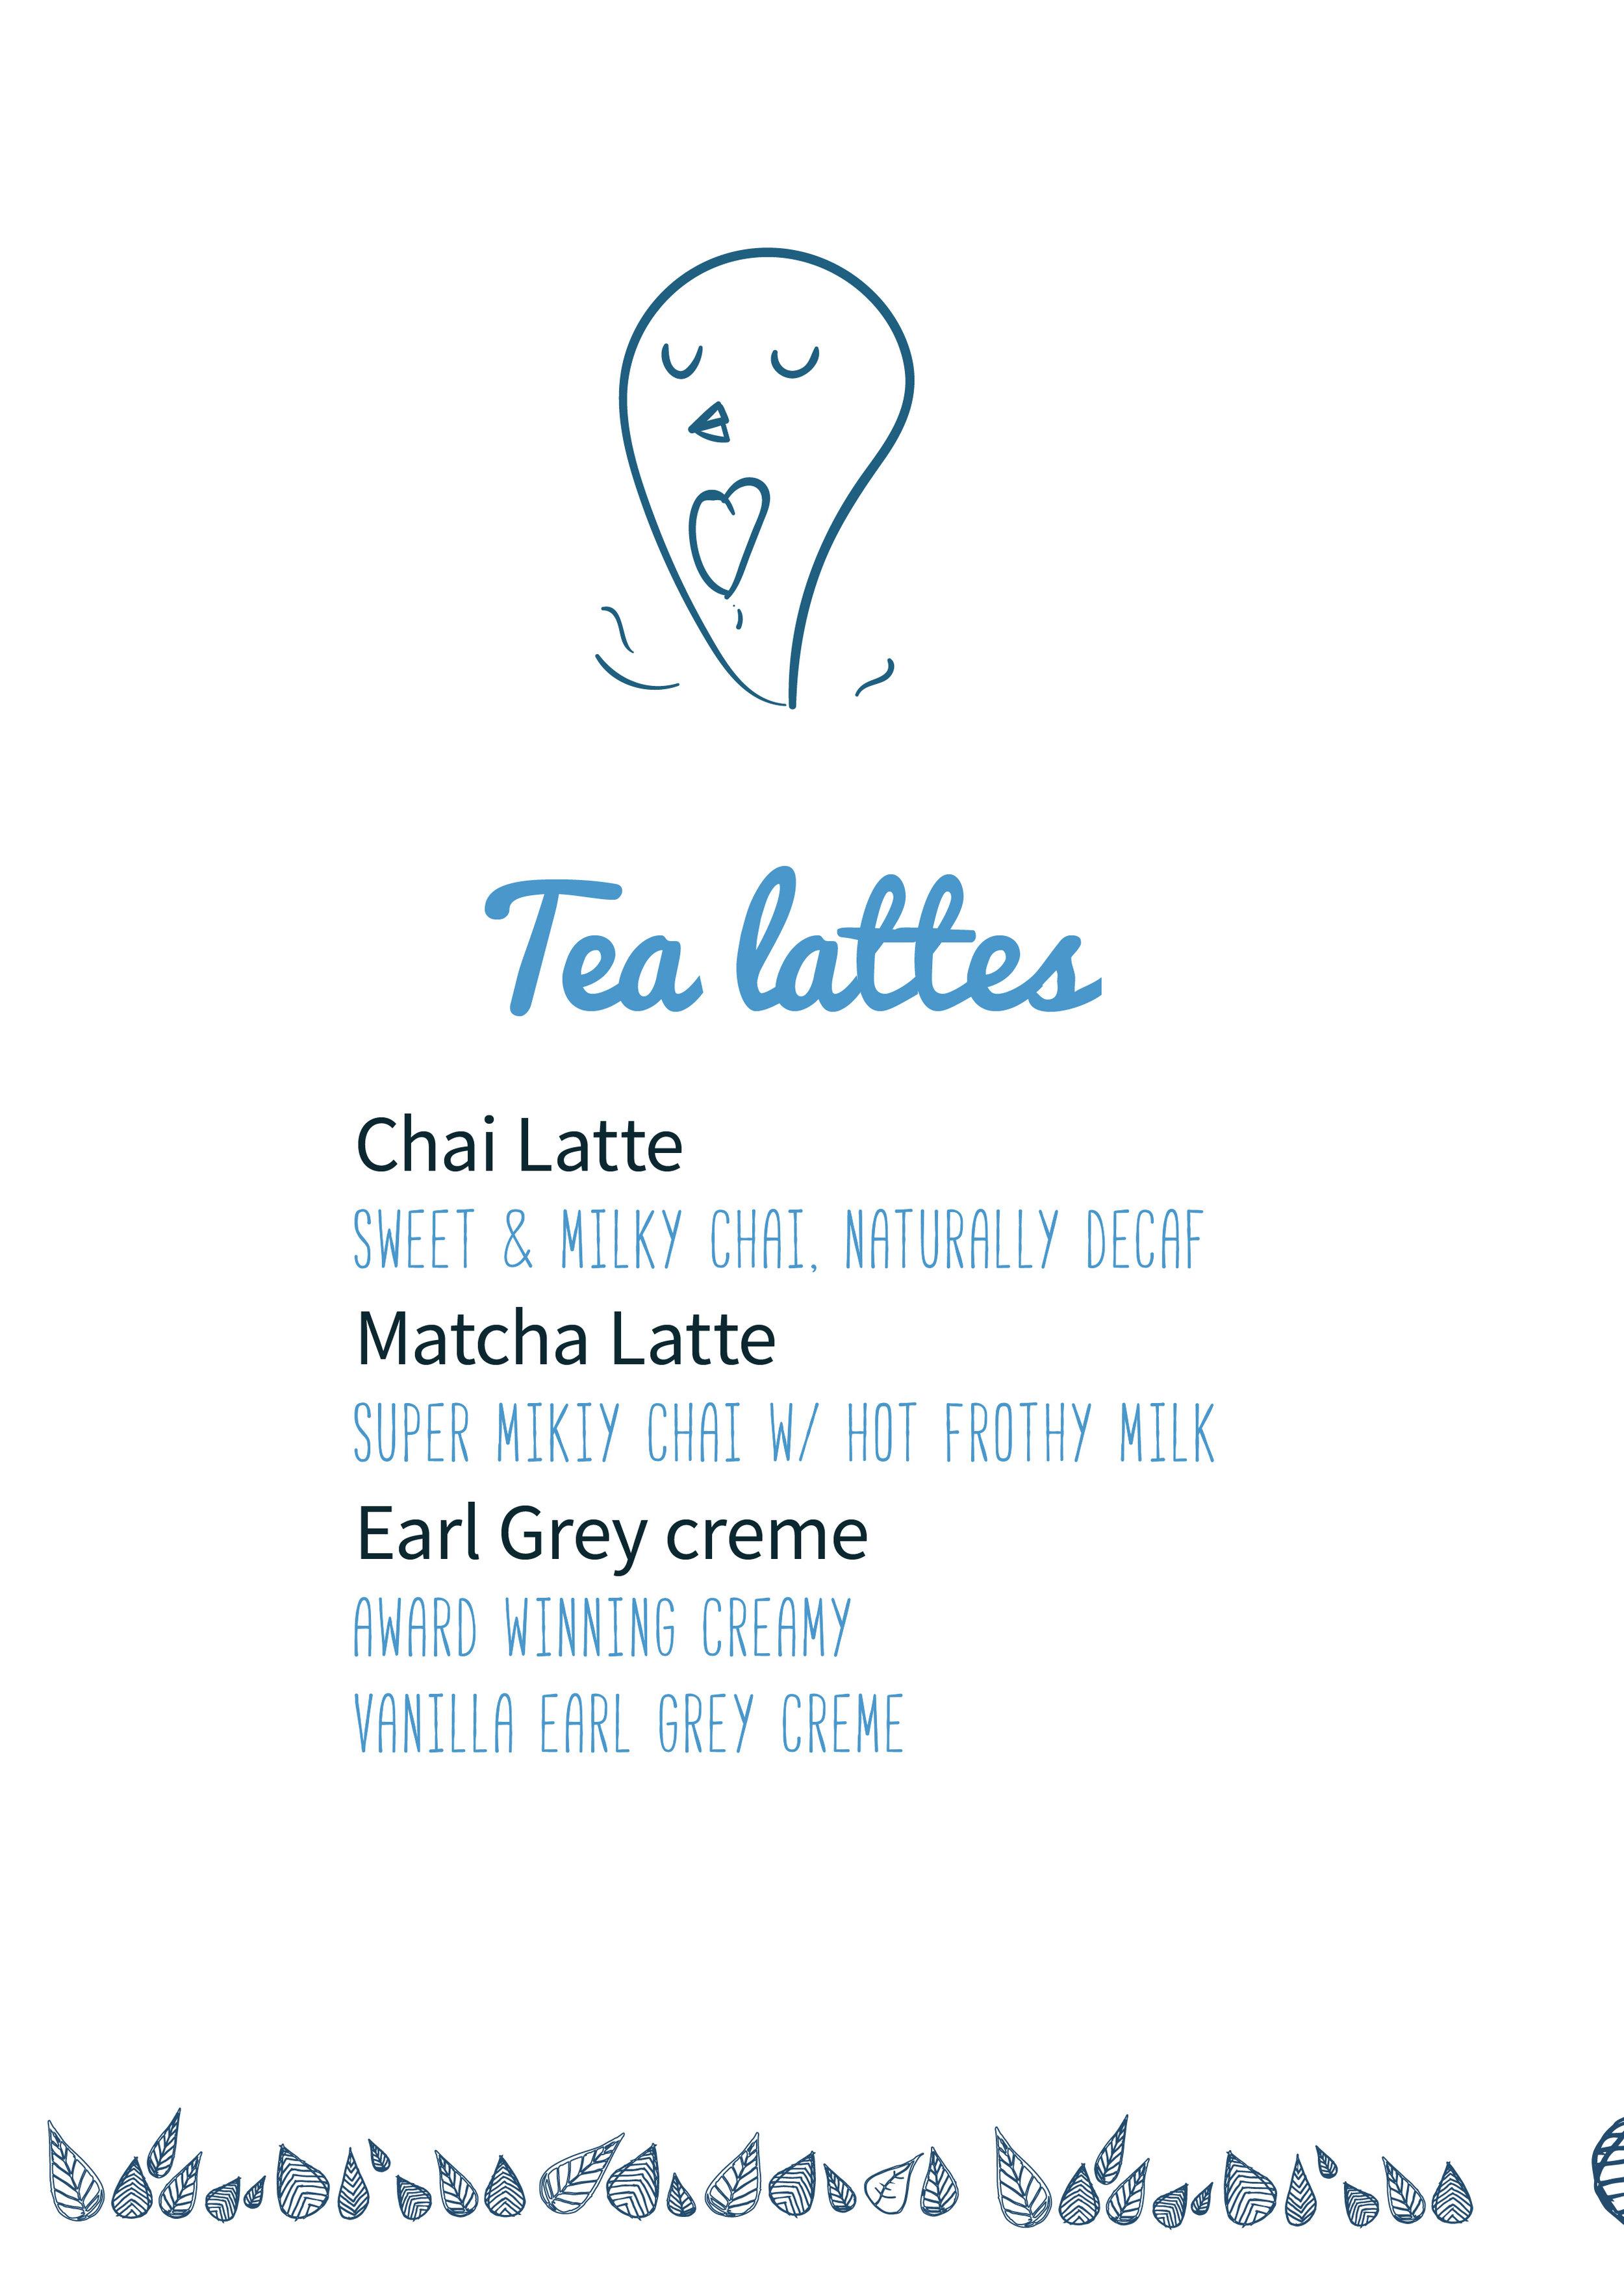 Illustration branding for menu